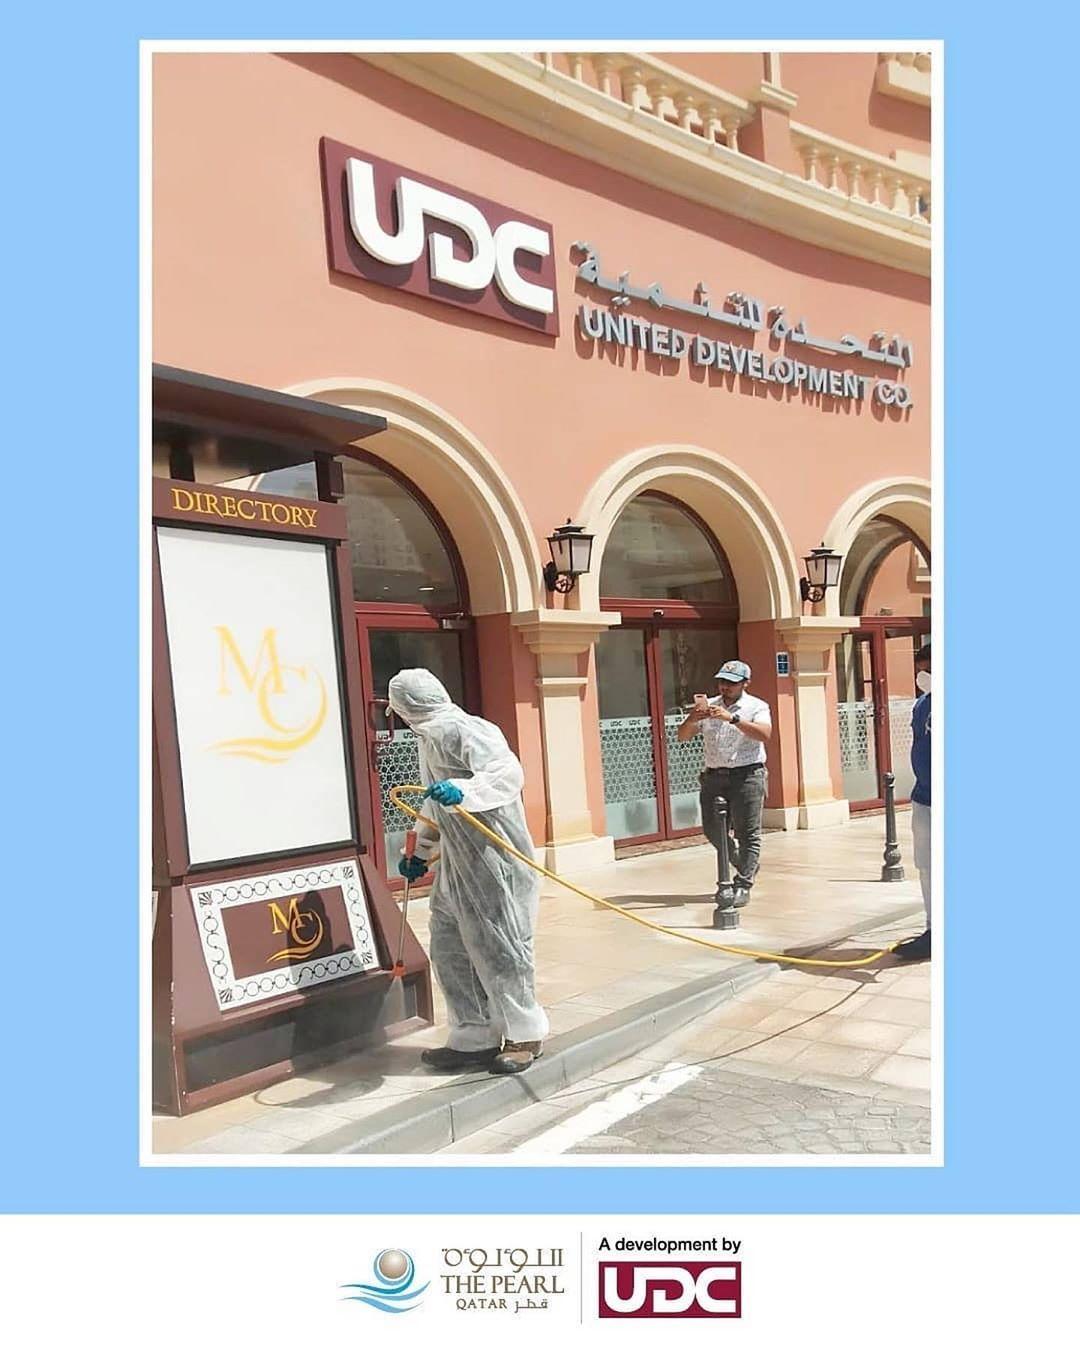 UDC takes active preventive measures to contain the spread of coronavirus